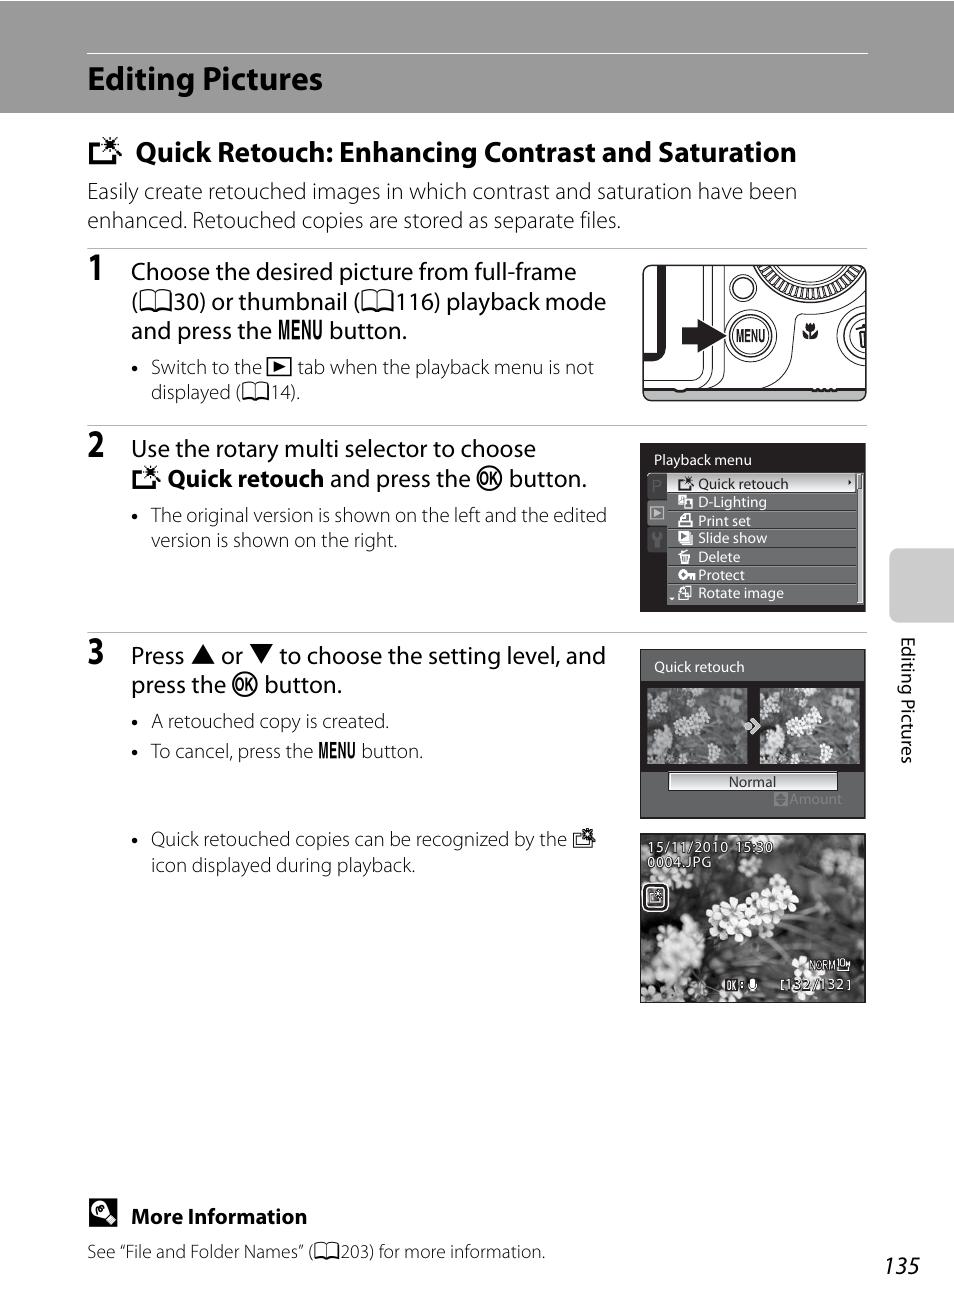 Инструкция Nikon P7000 PDF - Cikozy